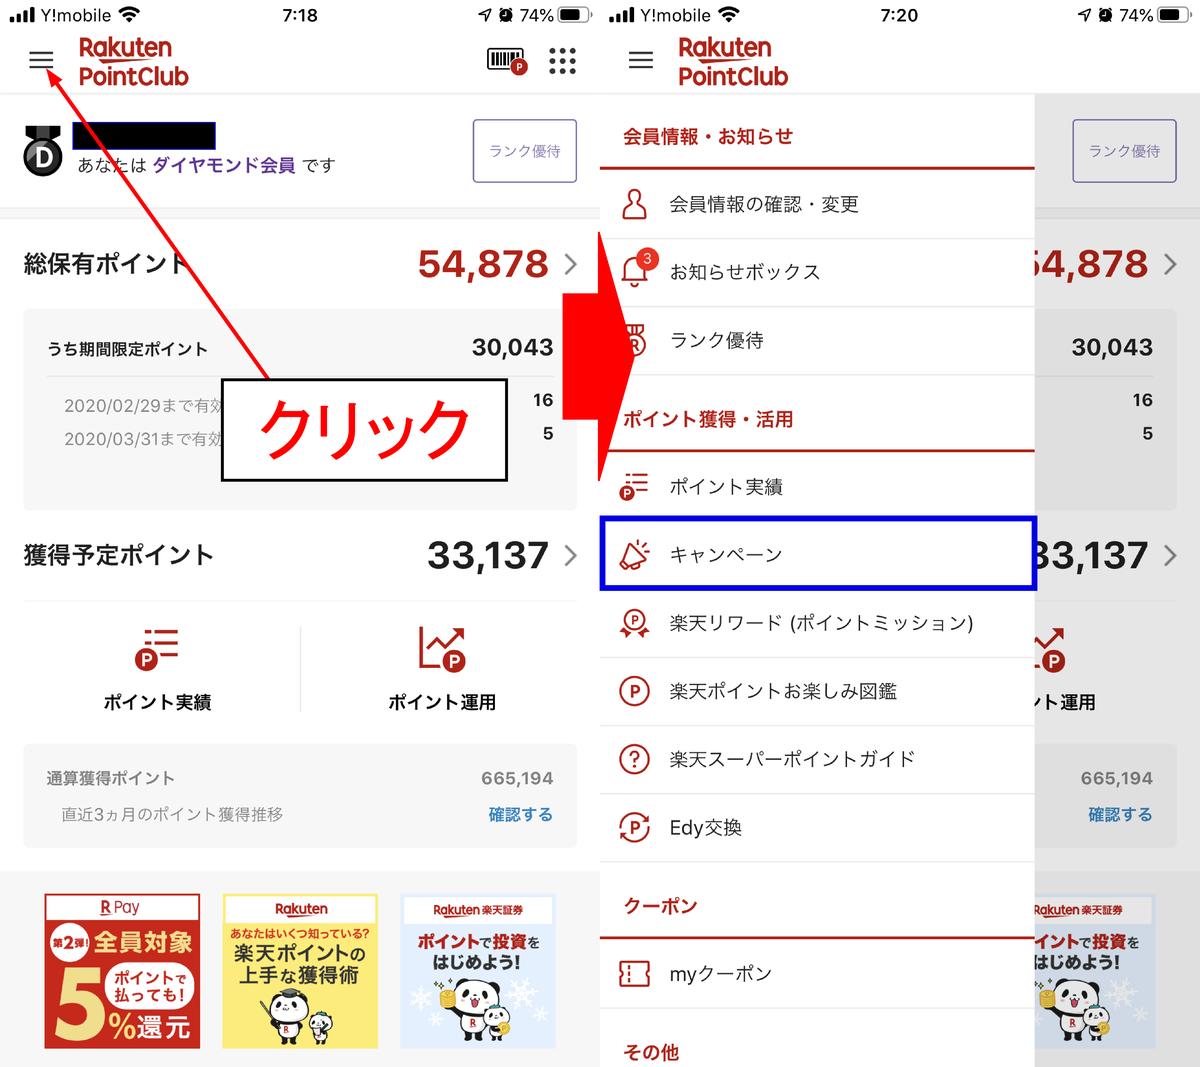 f:id:Nagoya1976:20200314190925p:plain